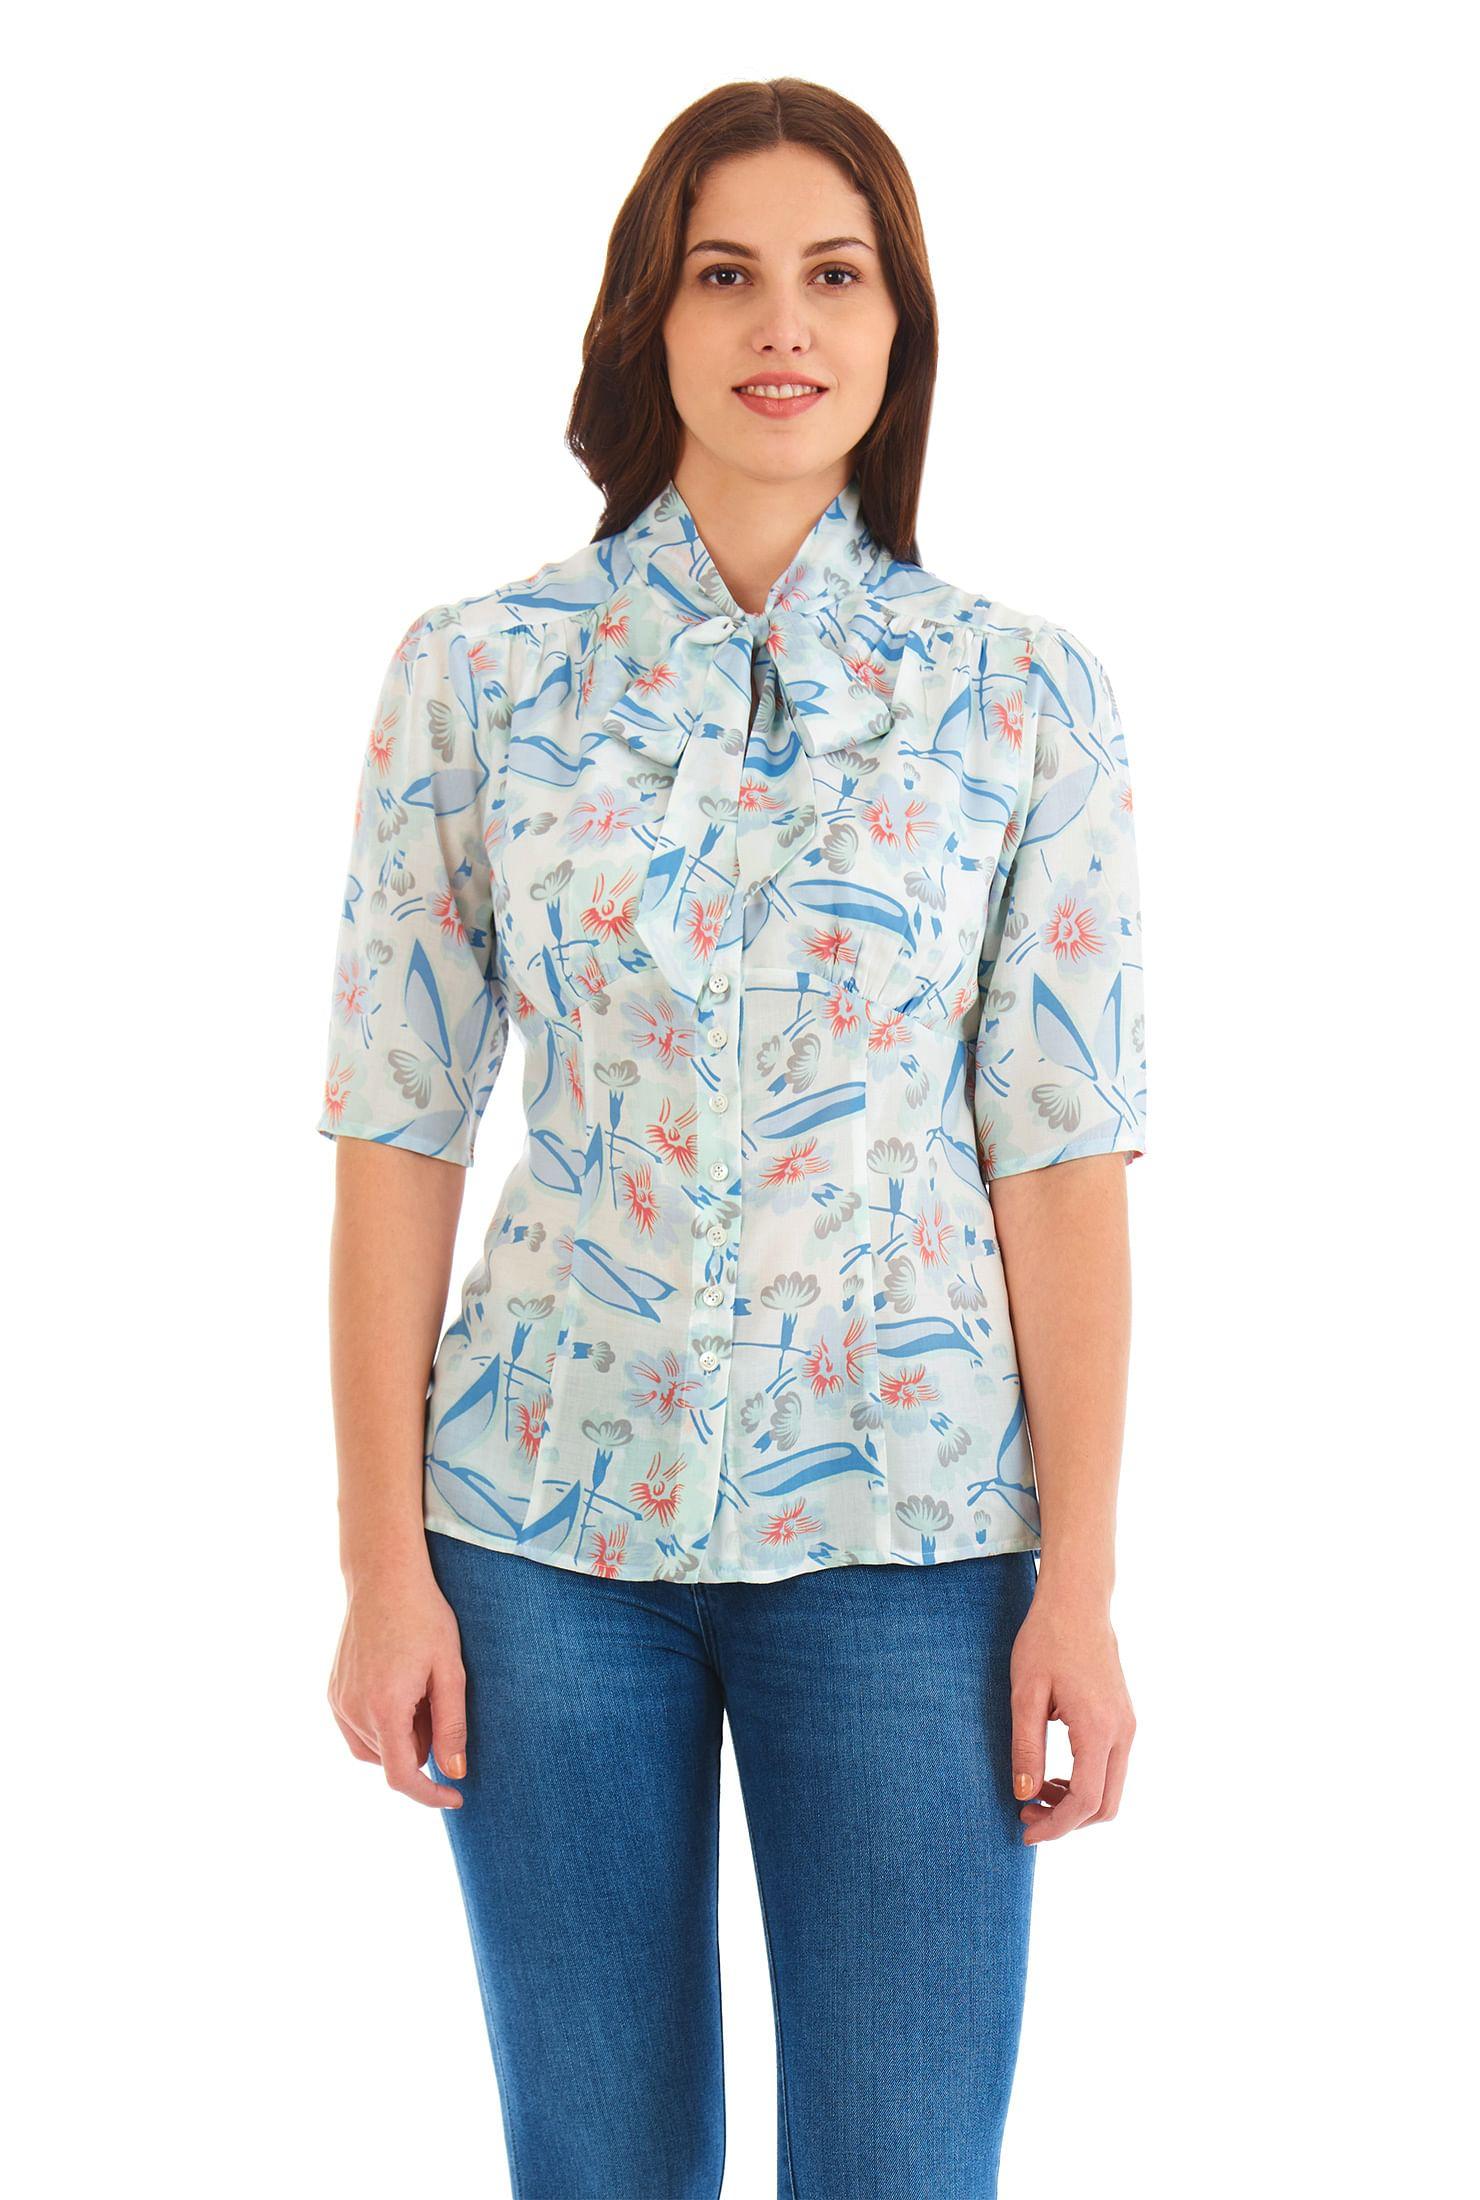 4e2c33d73 Blouses, Dry clean tops, Elbow length sleeve Tops, empire waist blouses,